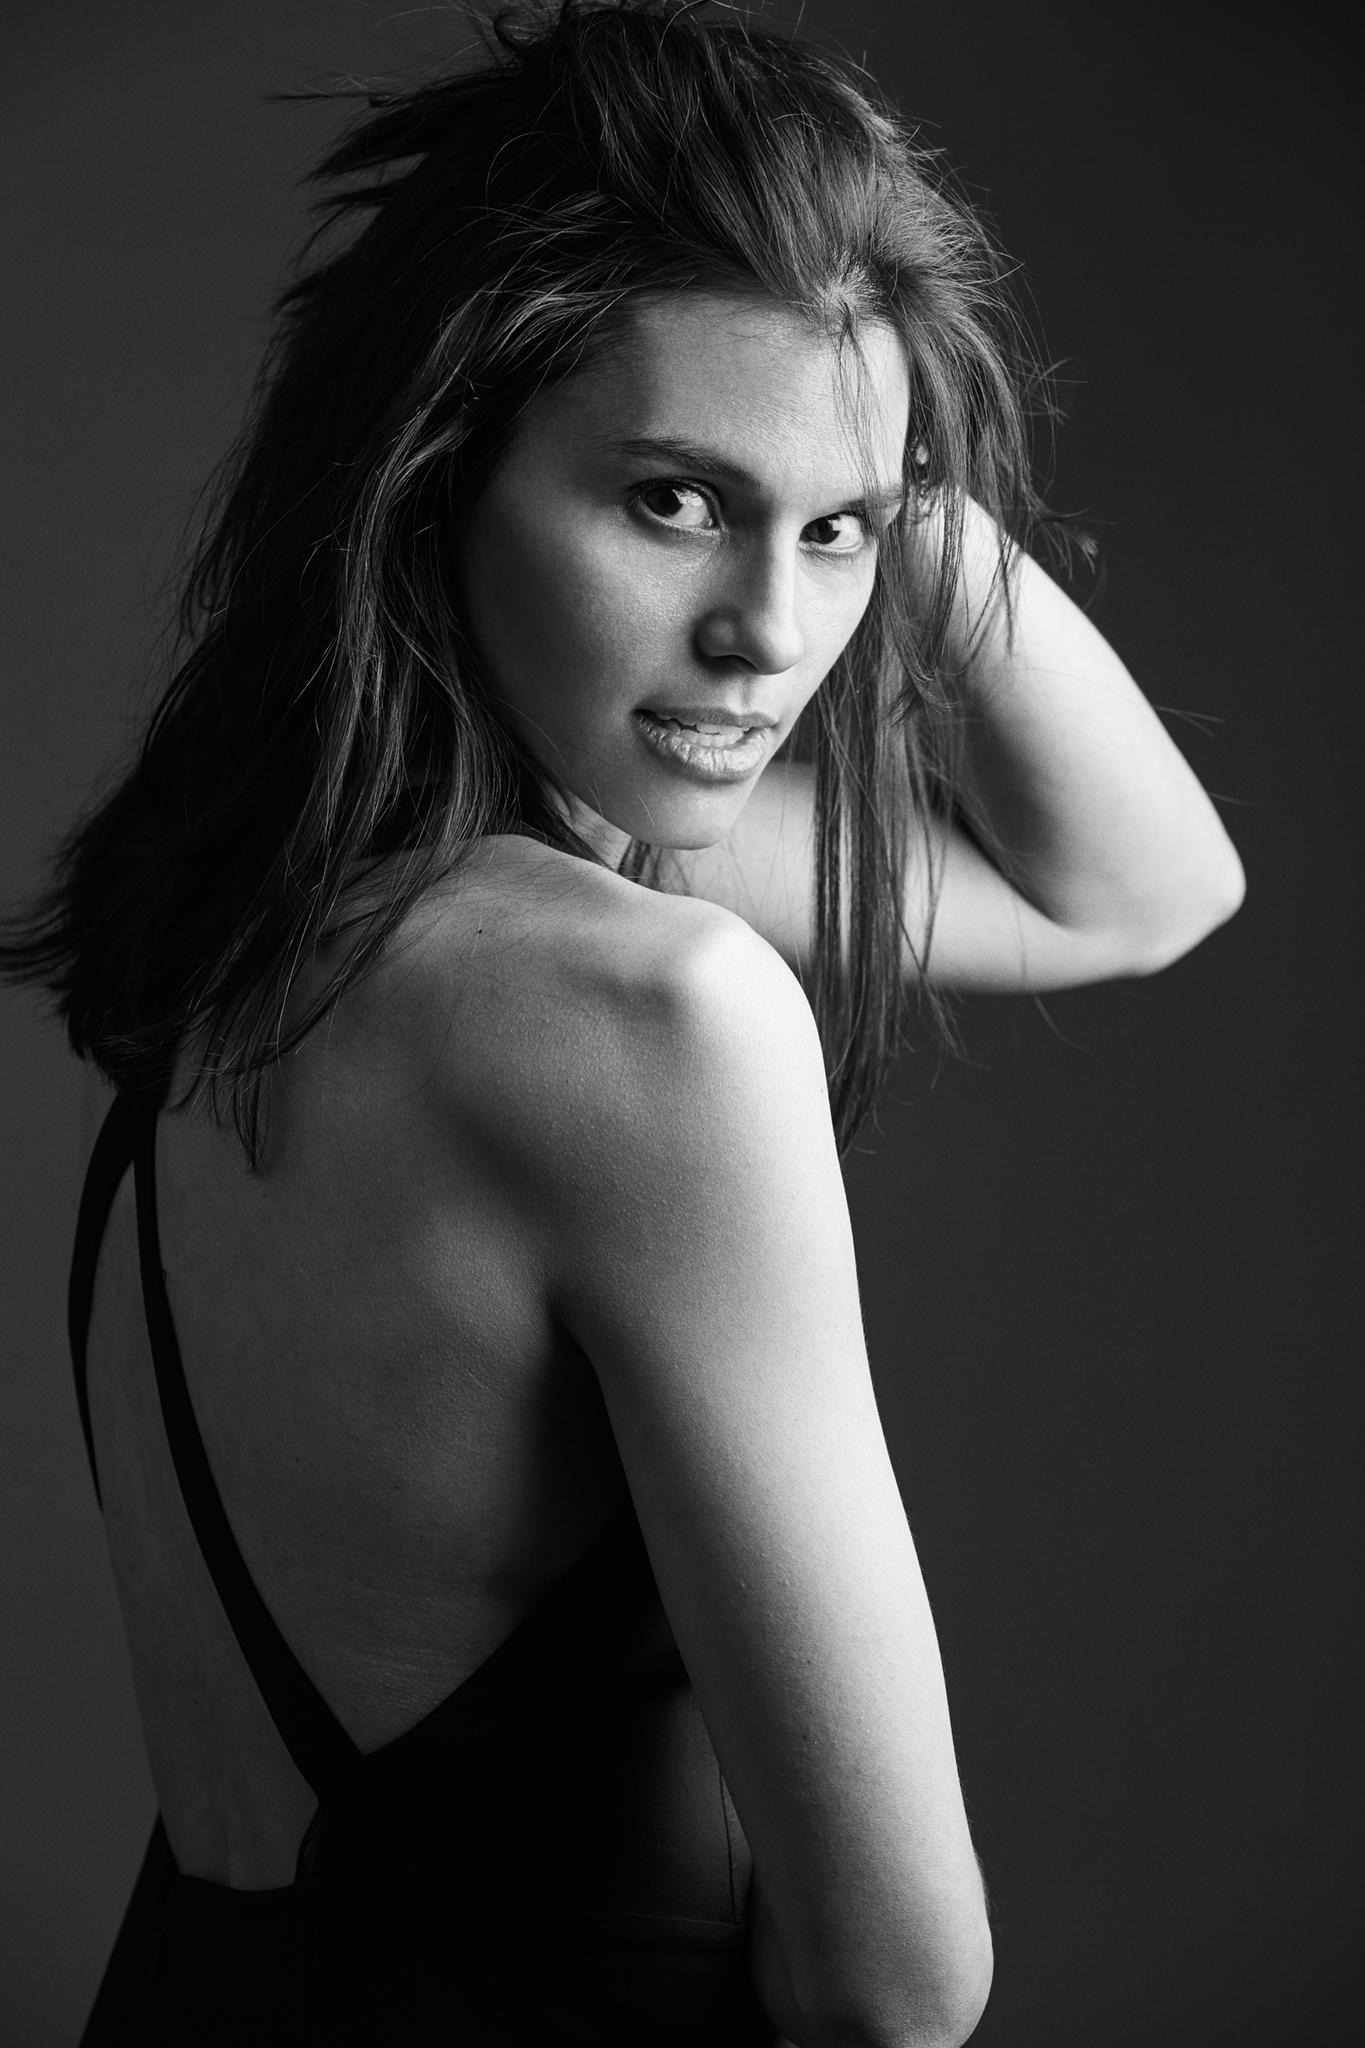 Nicole_Peelman_Portrait_Commercial_Model_Fashion_Shoot_Minneapolis_Photographer_Joe_Lemke_004.JPG